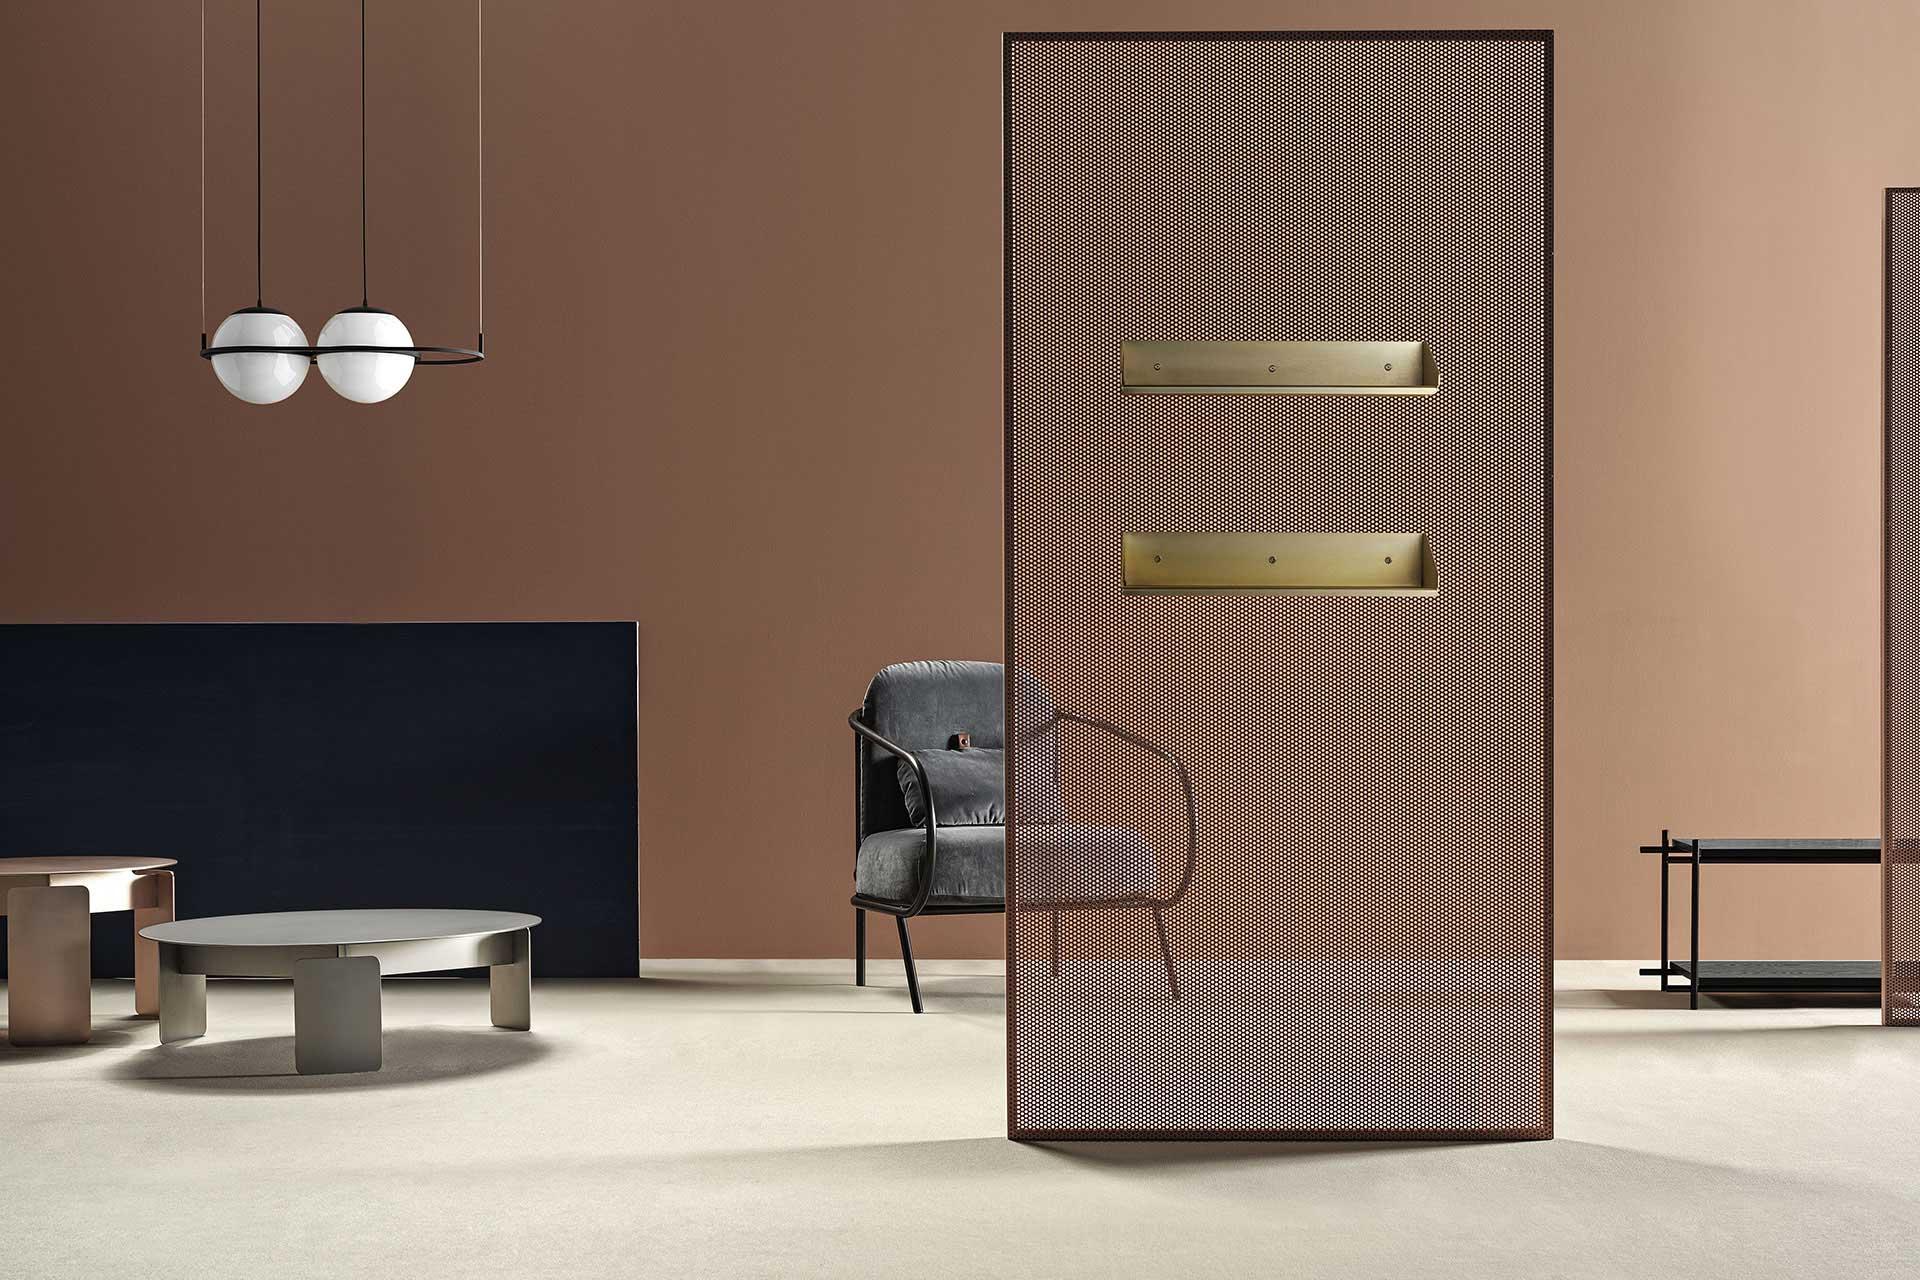 Arredamento Di Design mingardo - italian metal design